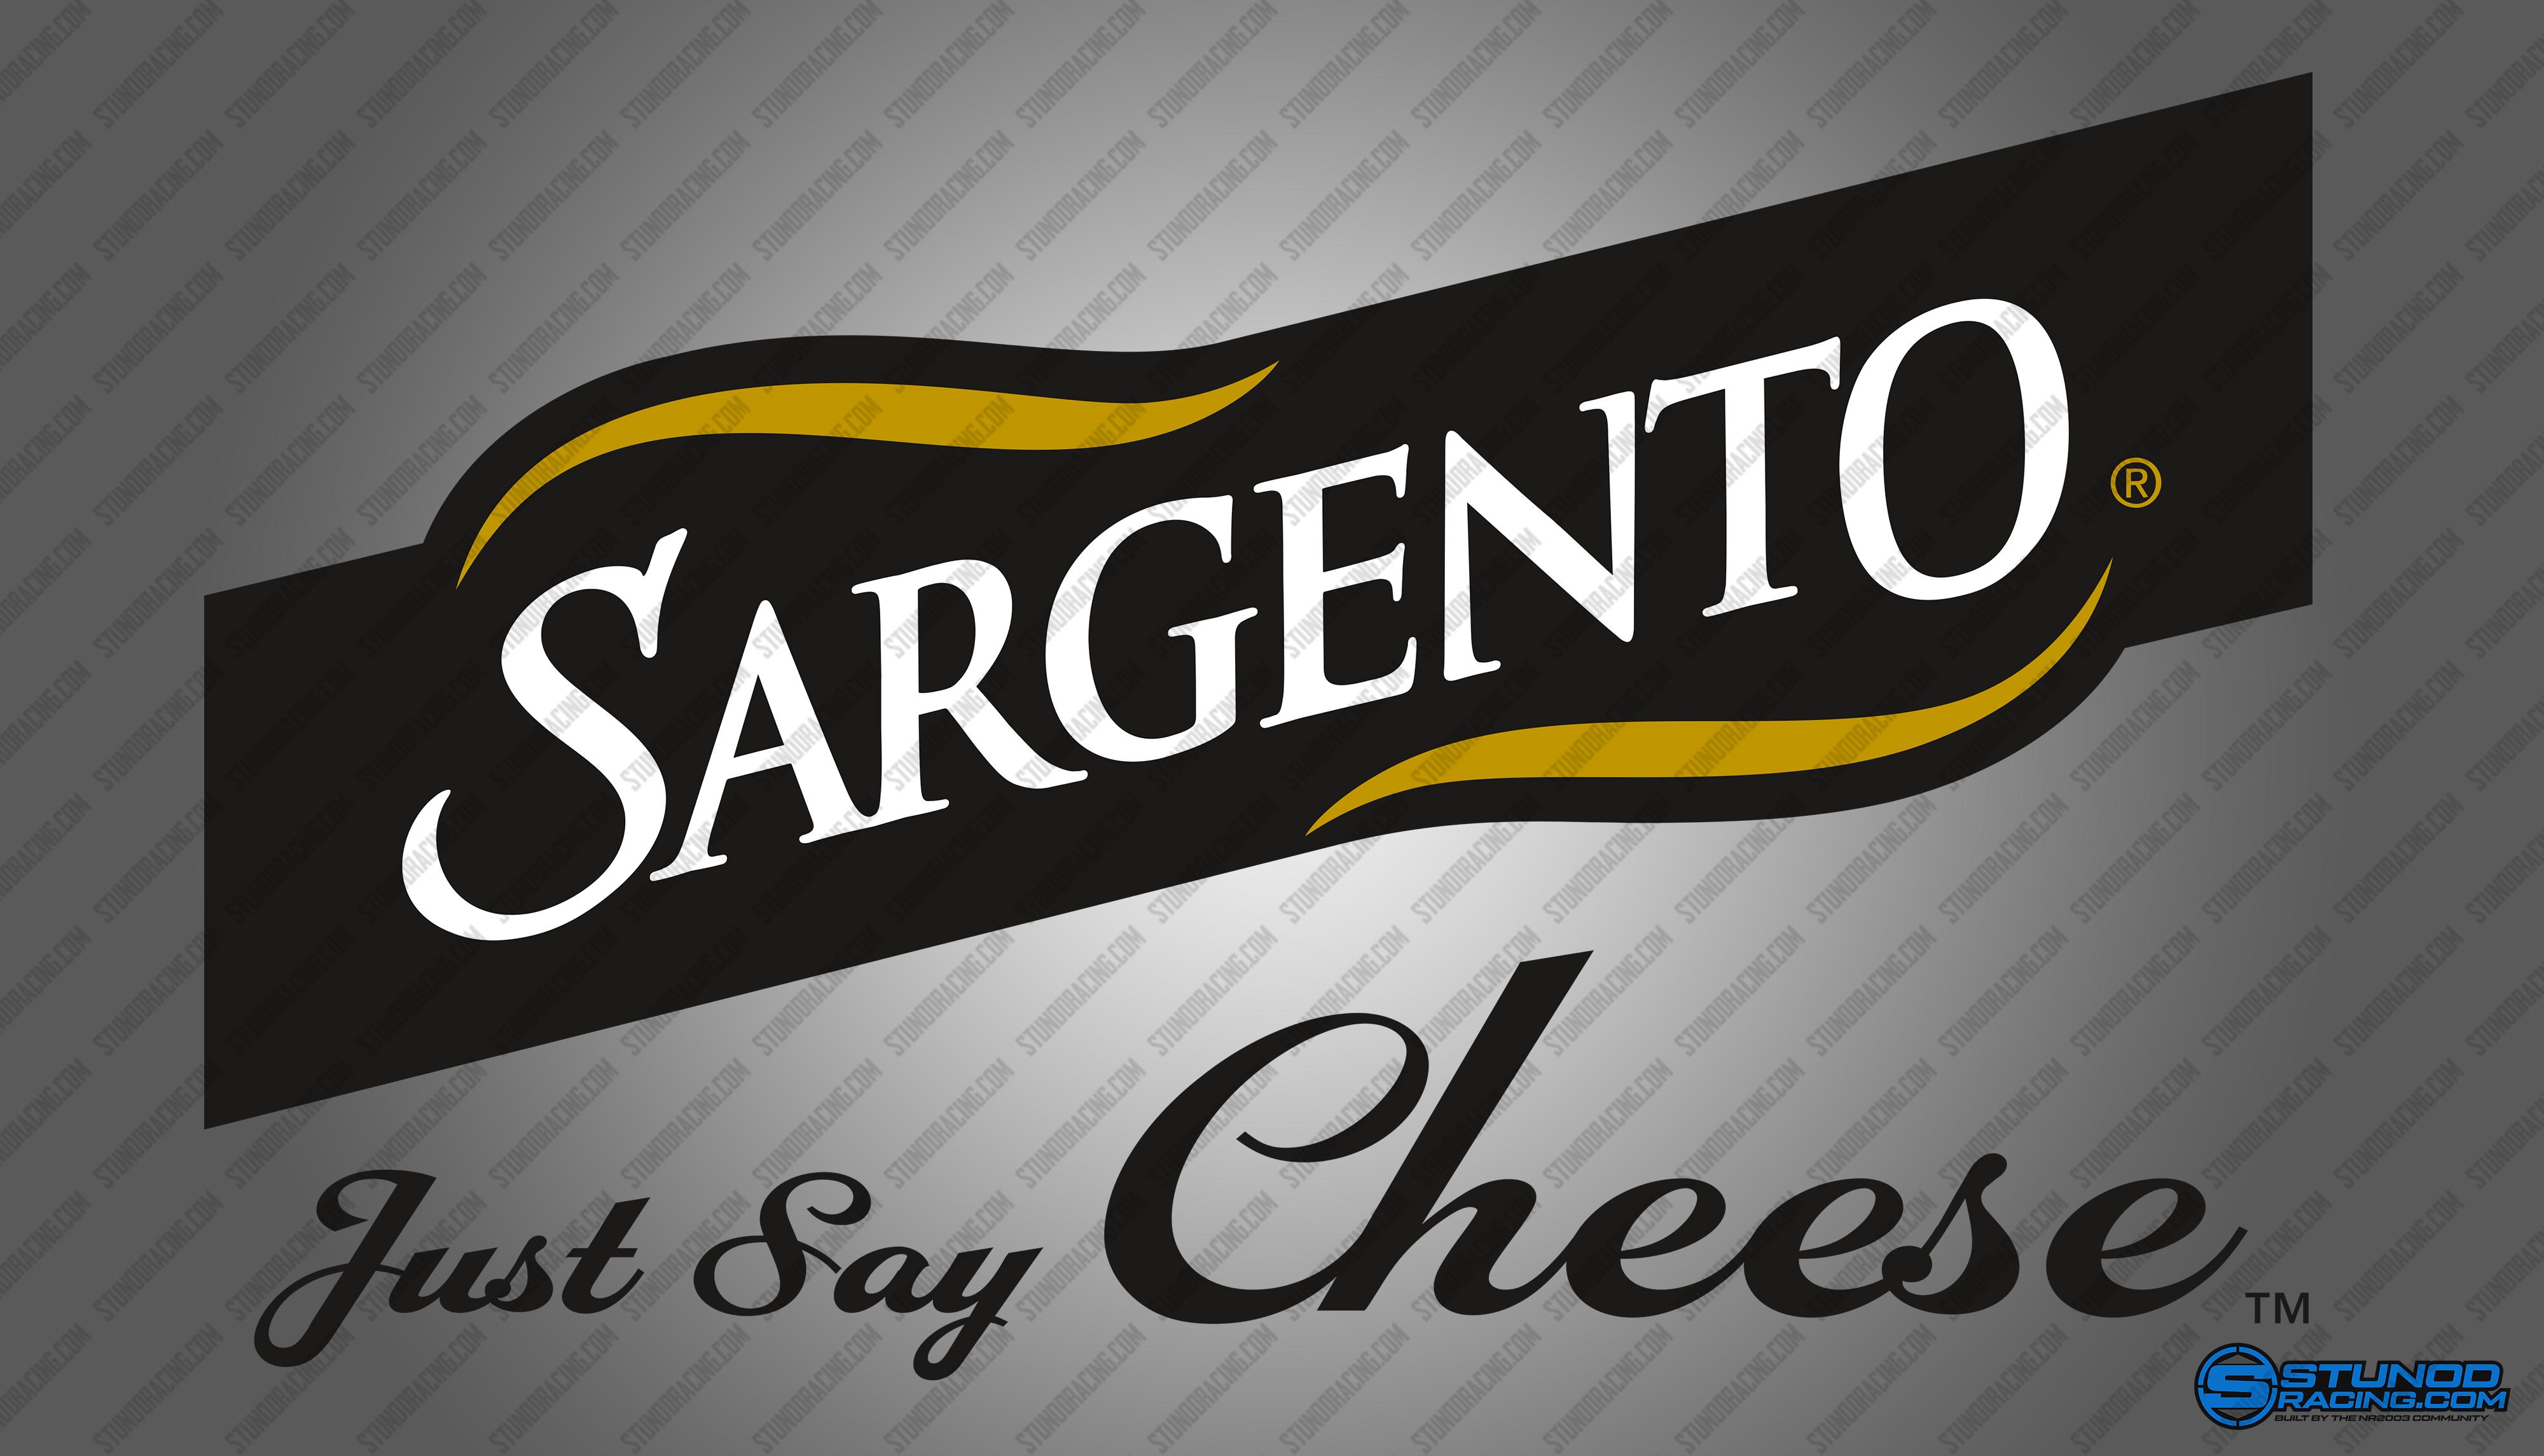 StunodRacing_Sargento_Logo.jpg